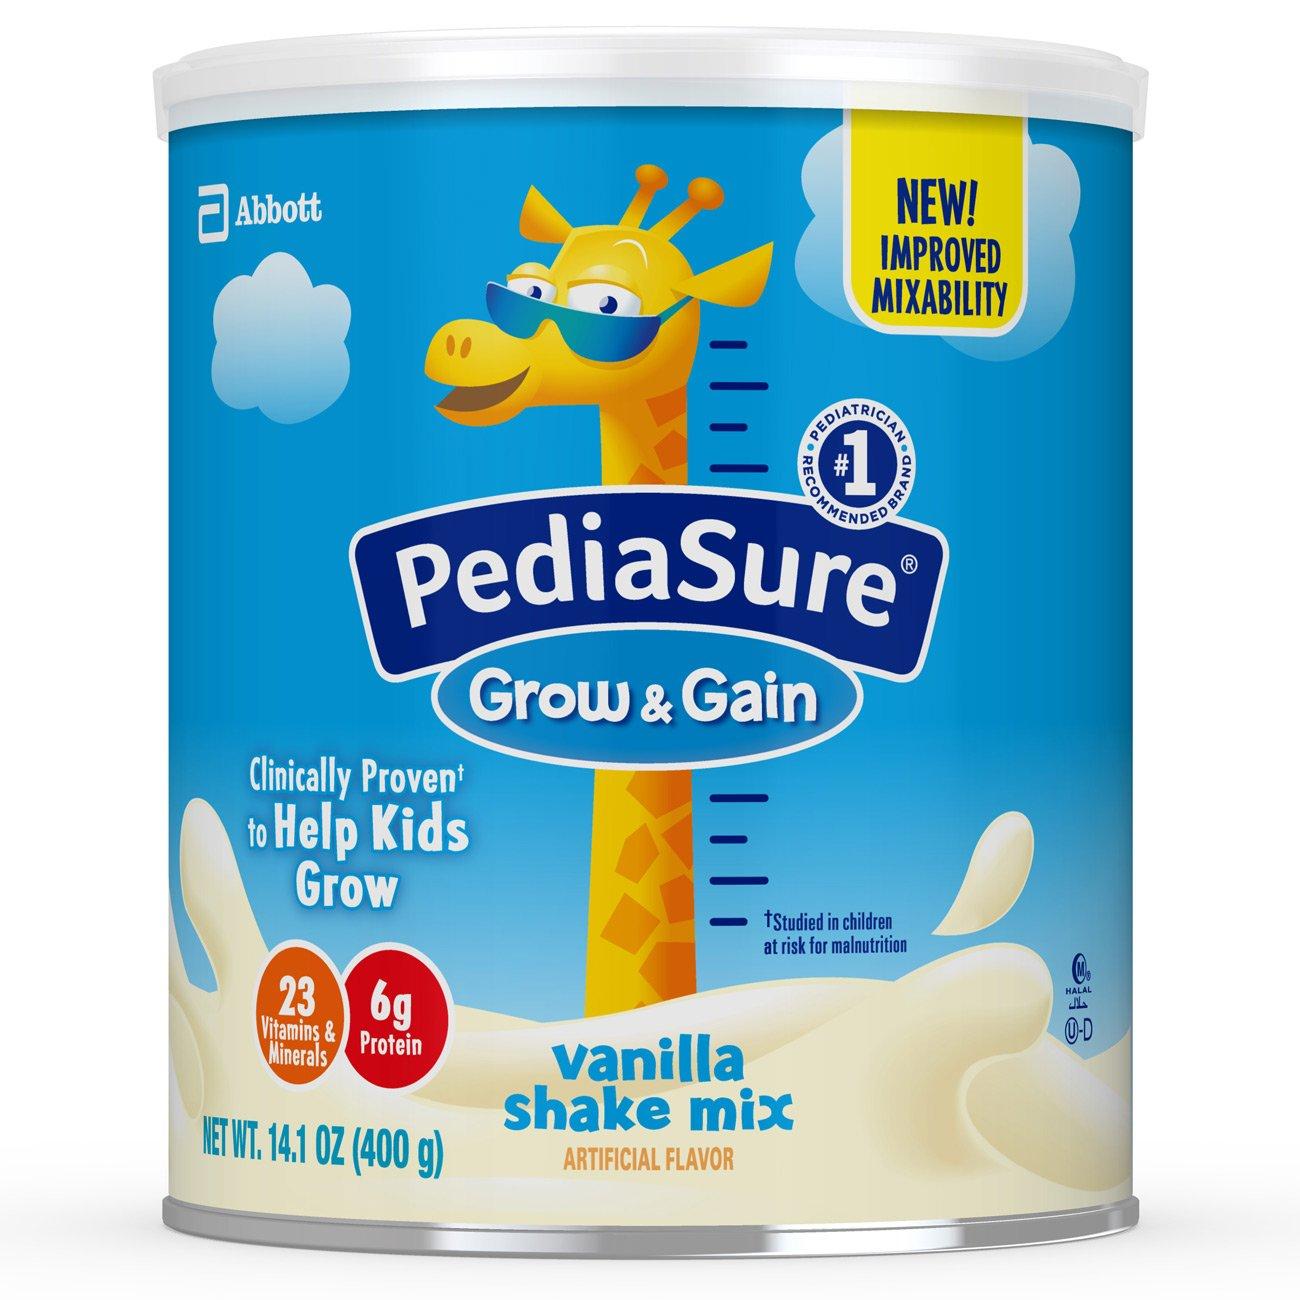 PediaSure Grow & Gain Non-GMO Vanilla Shake Mix Powder, Nutrition Shake for Kids, 14.1 oz, 3 count ABBN7 - pallet ordering 070074669533